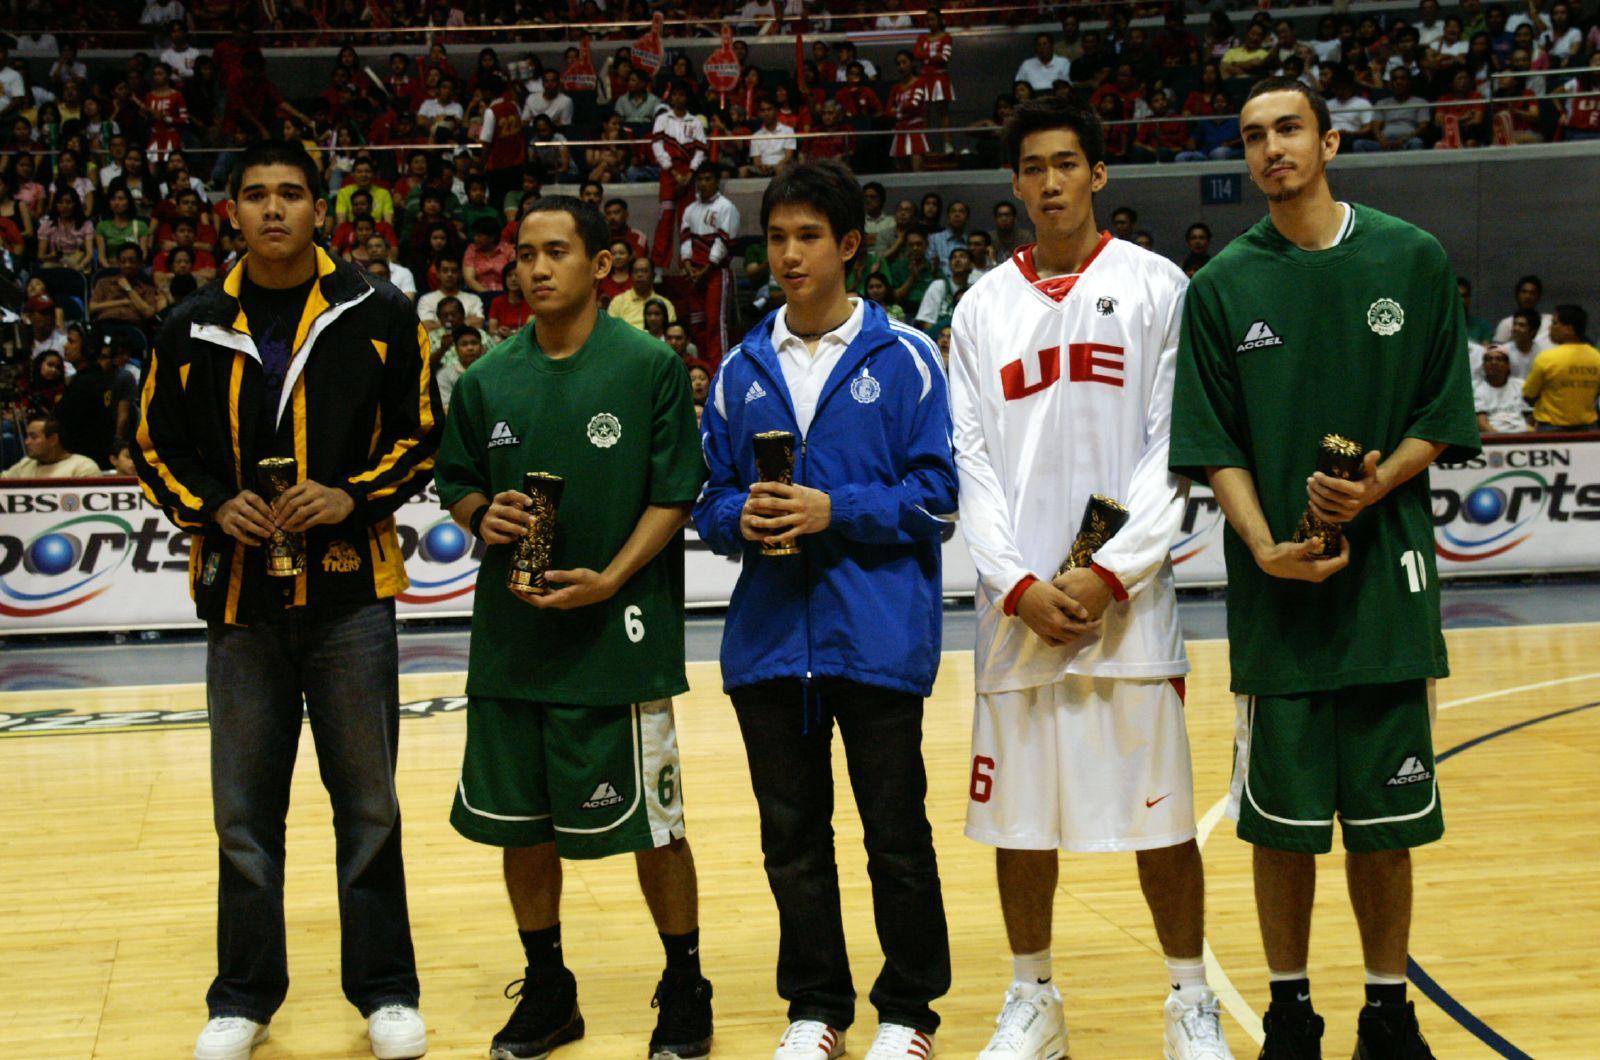 UAAP Season 70 men's basketball tournament - Wikipedia